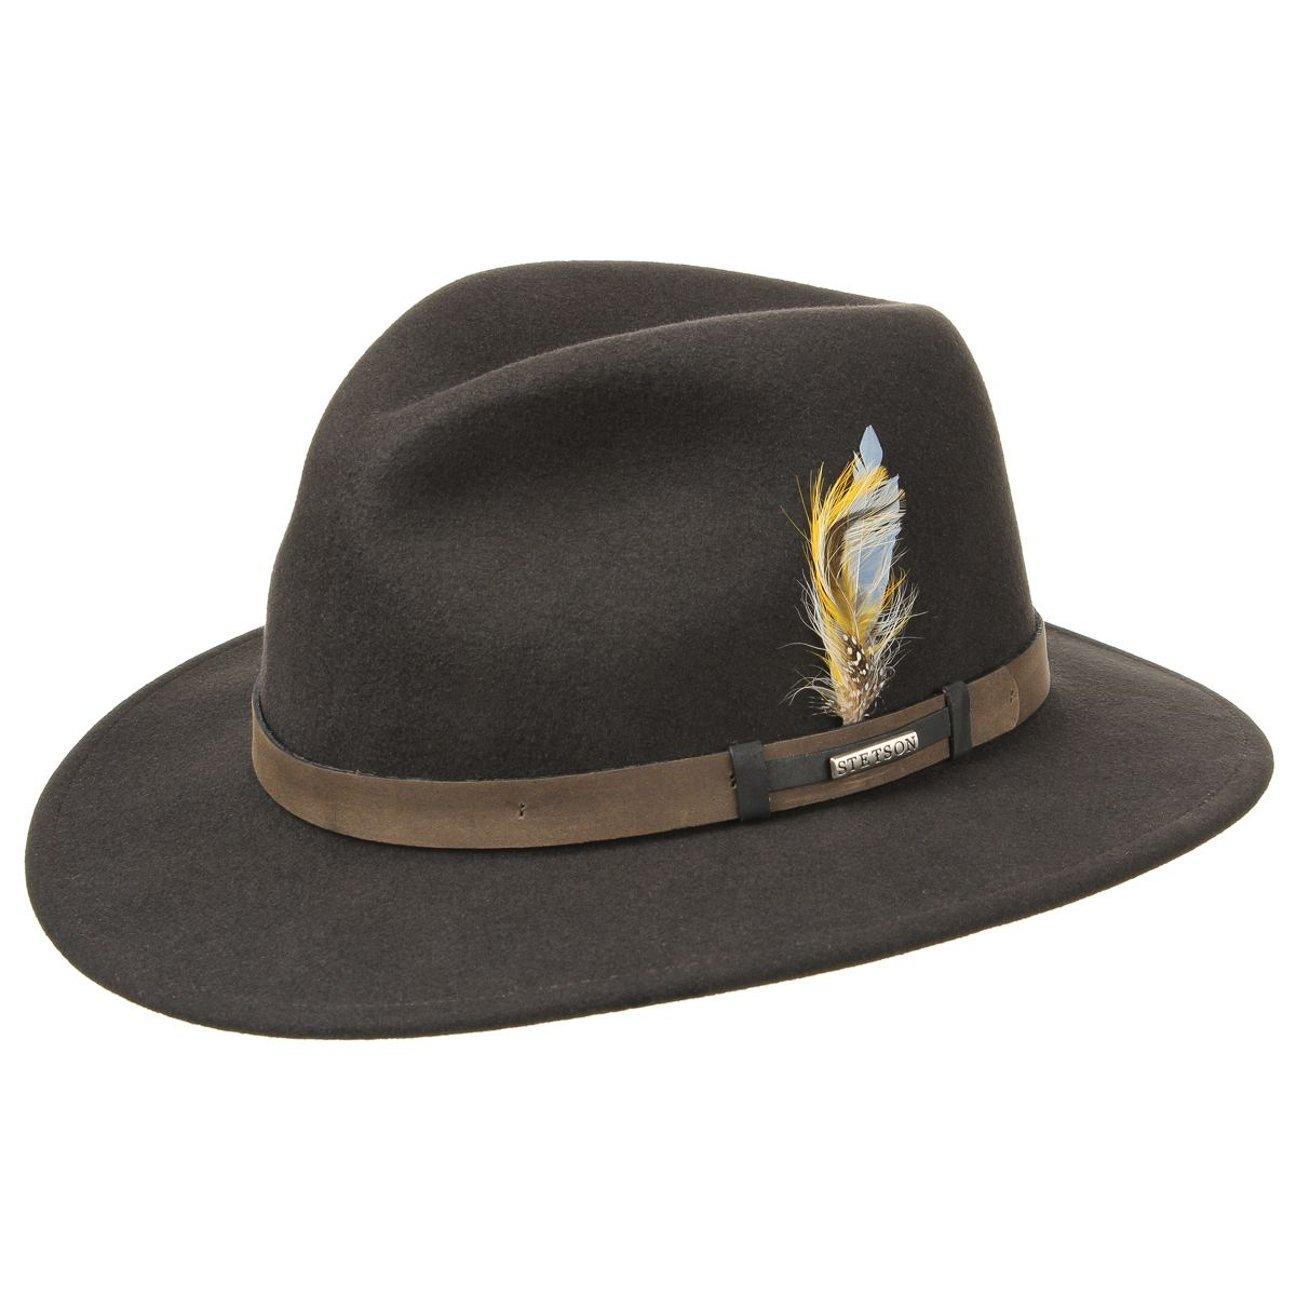 Stetson Sardis VitaFelt Traveller Hat hats leather band